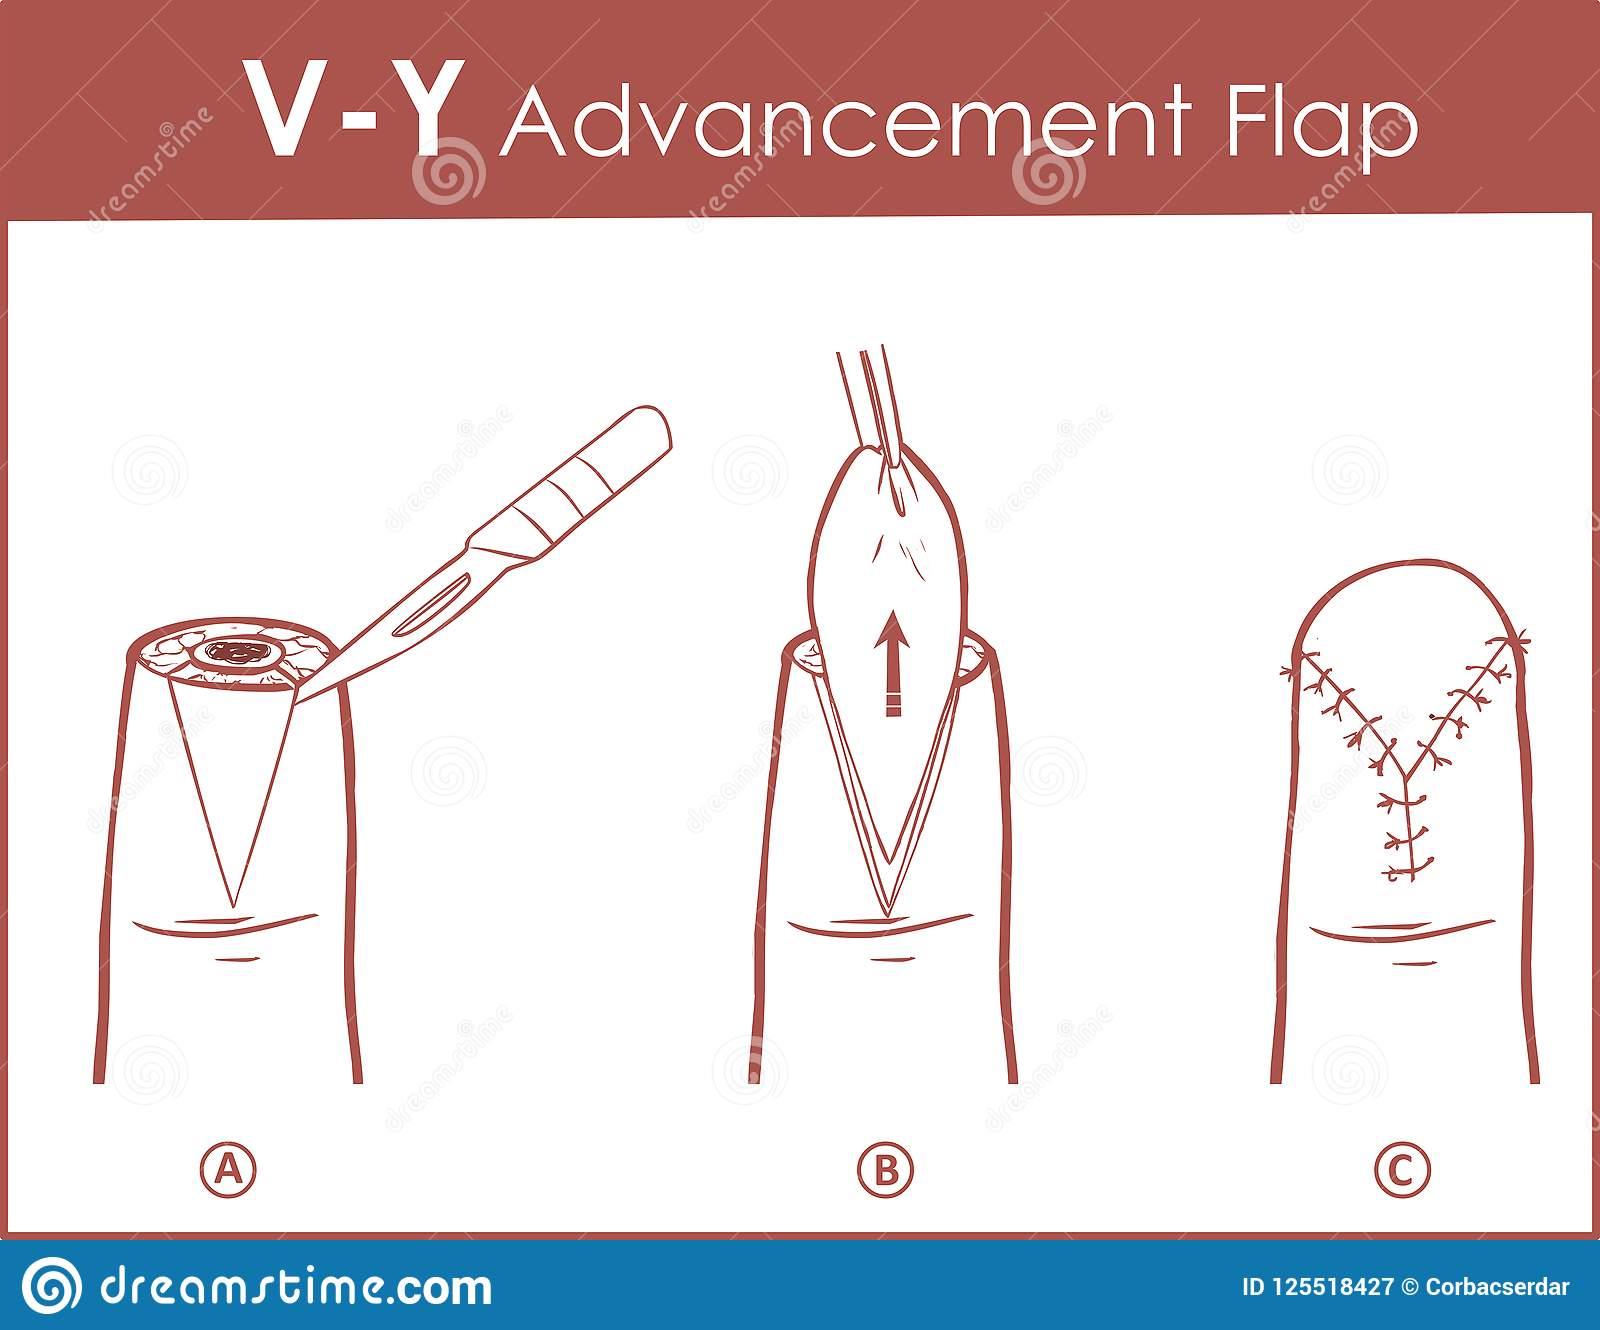 Vector illustration of a V-Y advancement flap